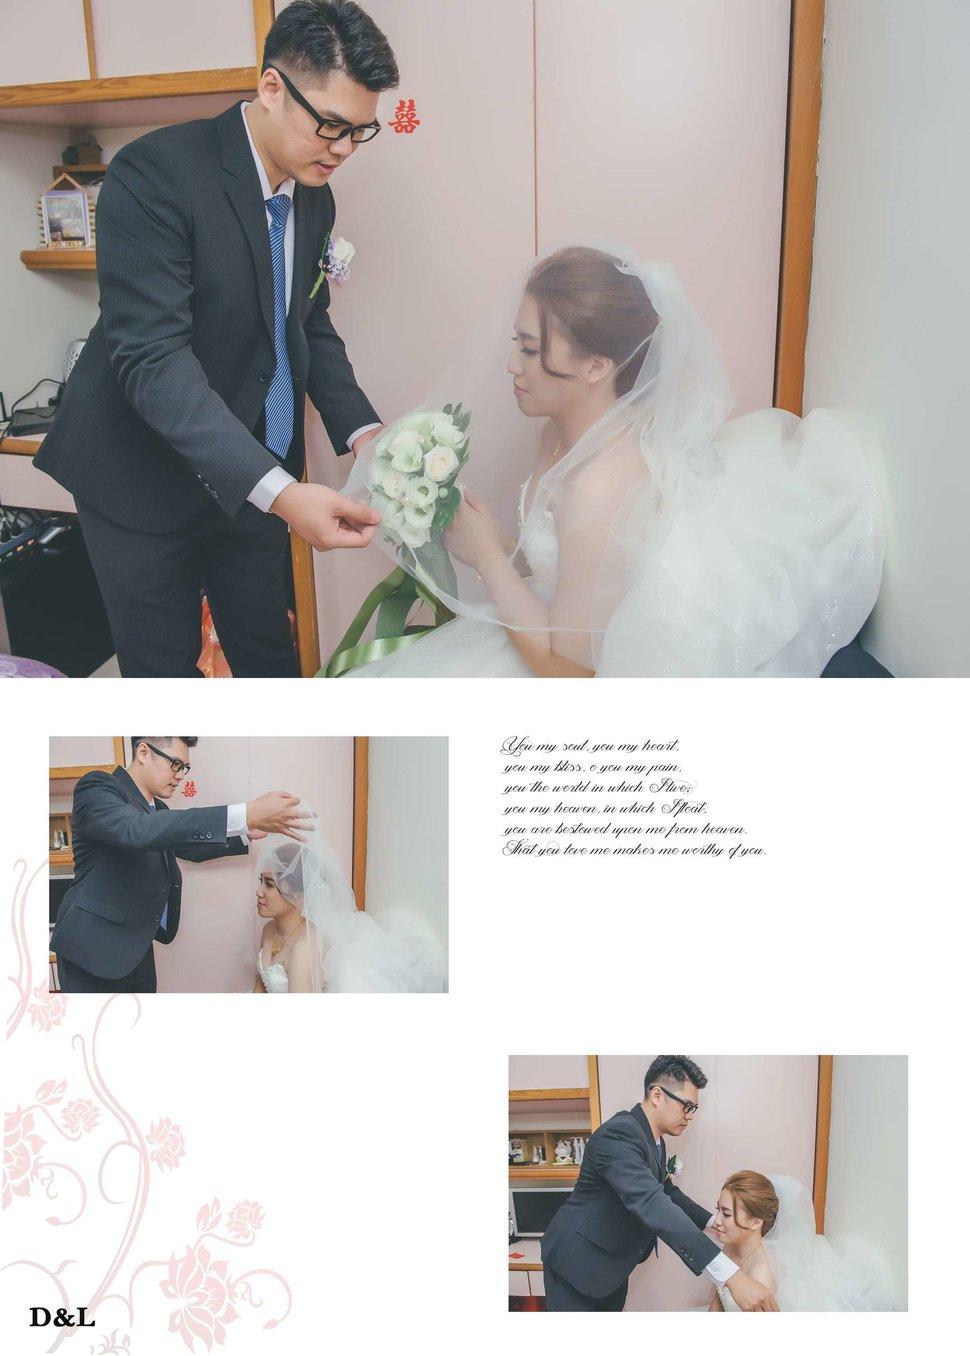 24 - D&L 婚禮事務 · 婚禮婚紗攝影 - 結婚吧